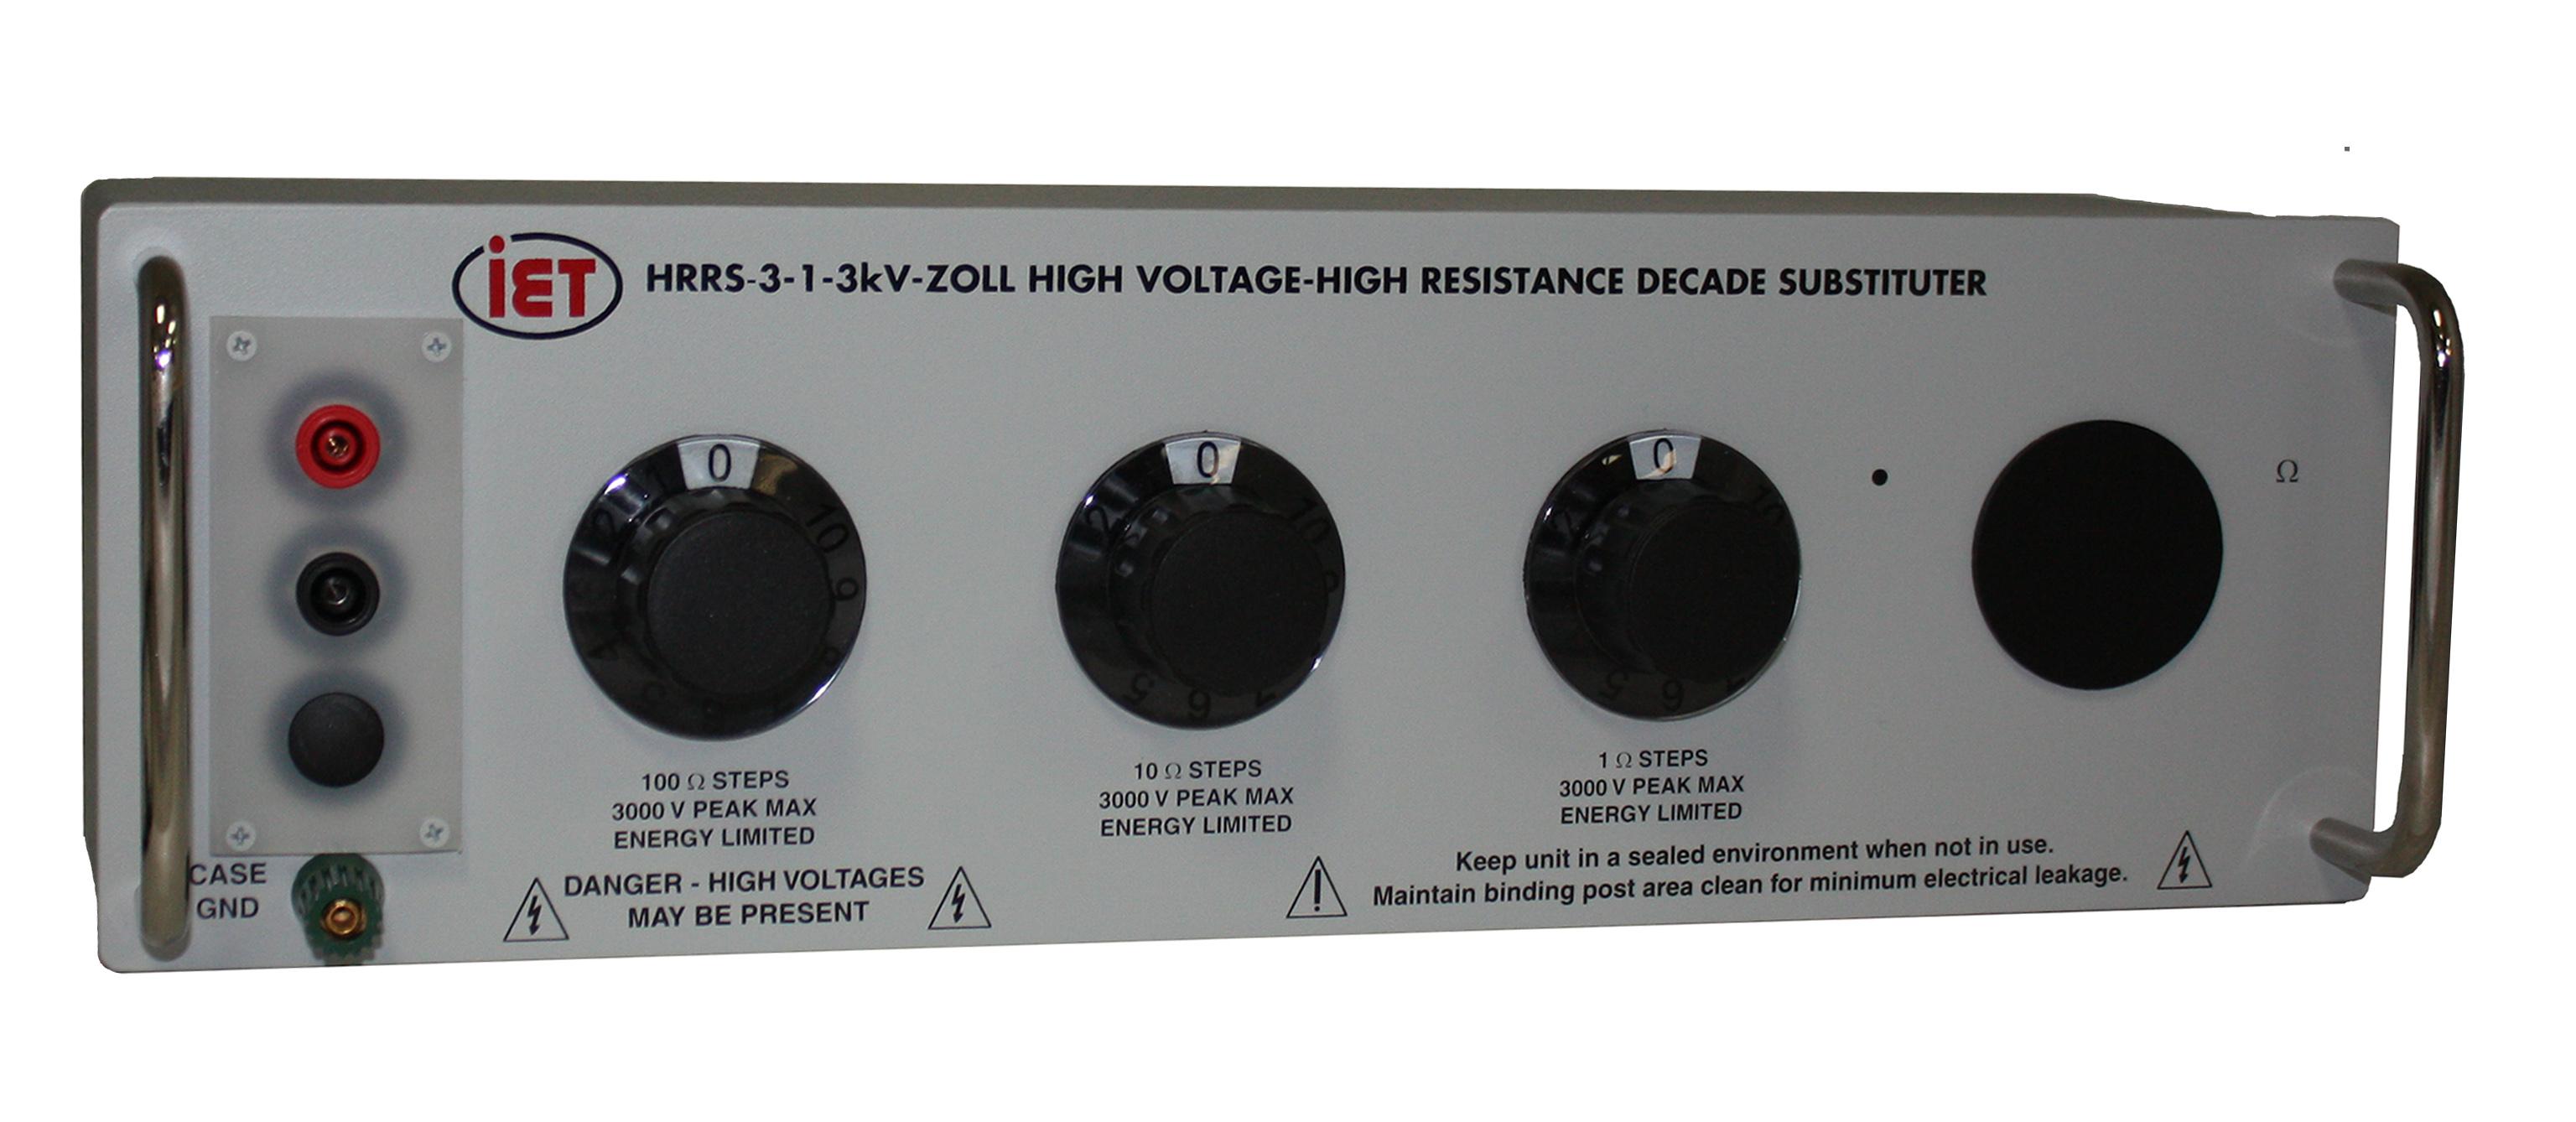 HRRS-Zoll-F-3 10 년 저항기